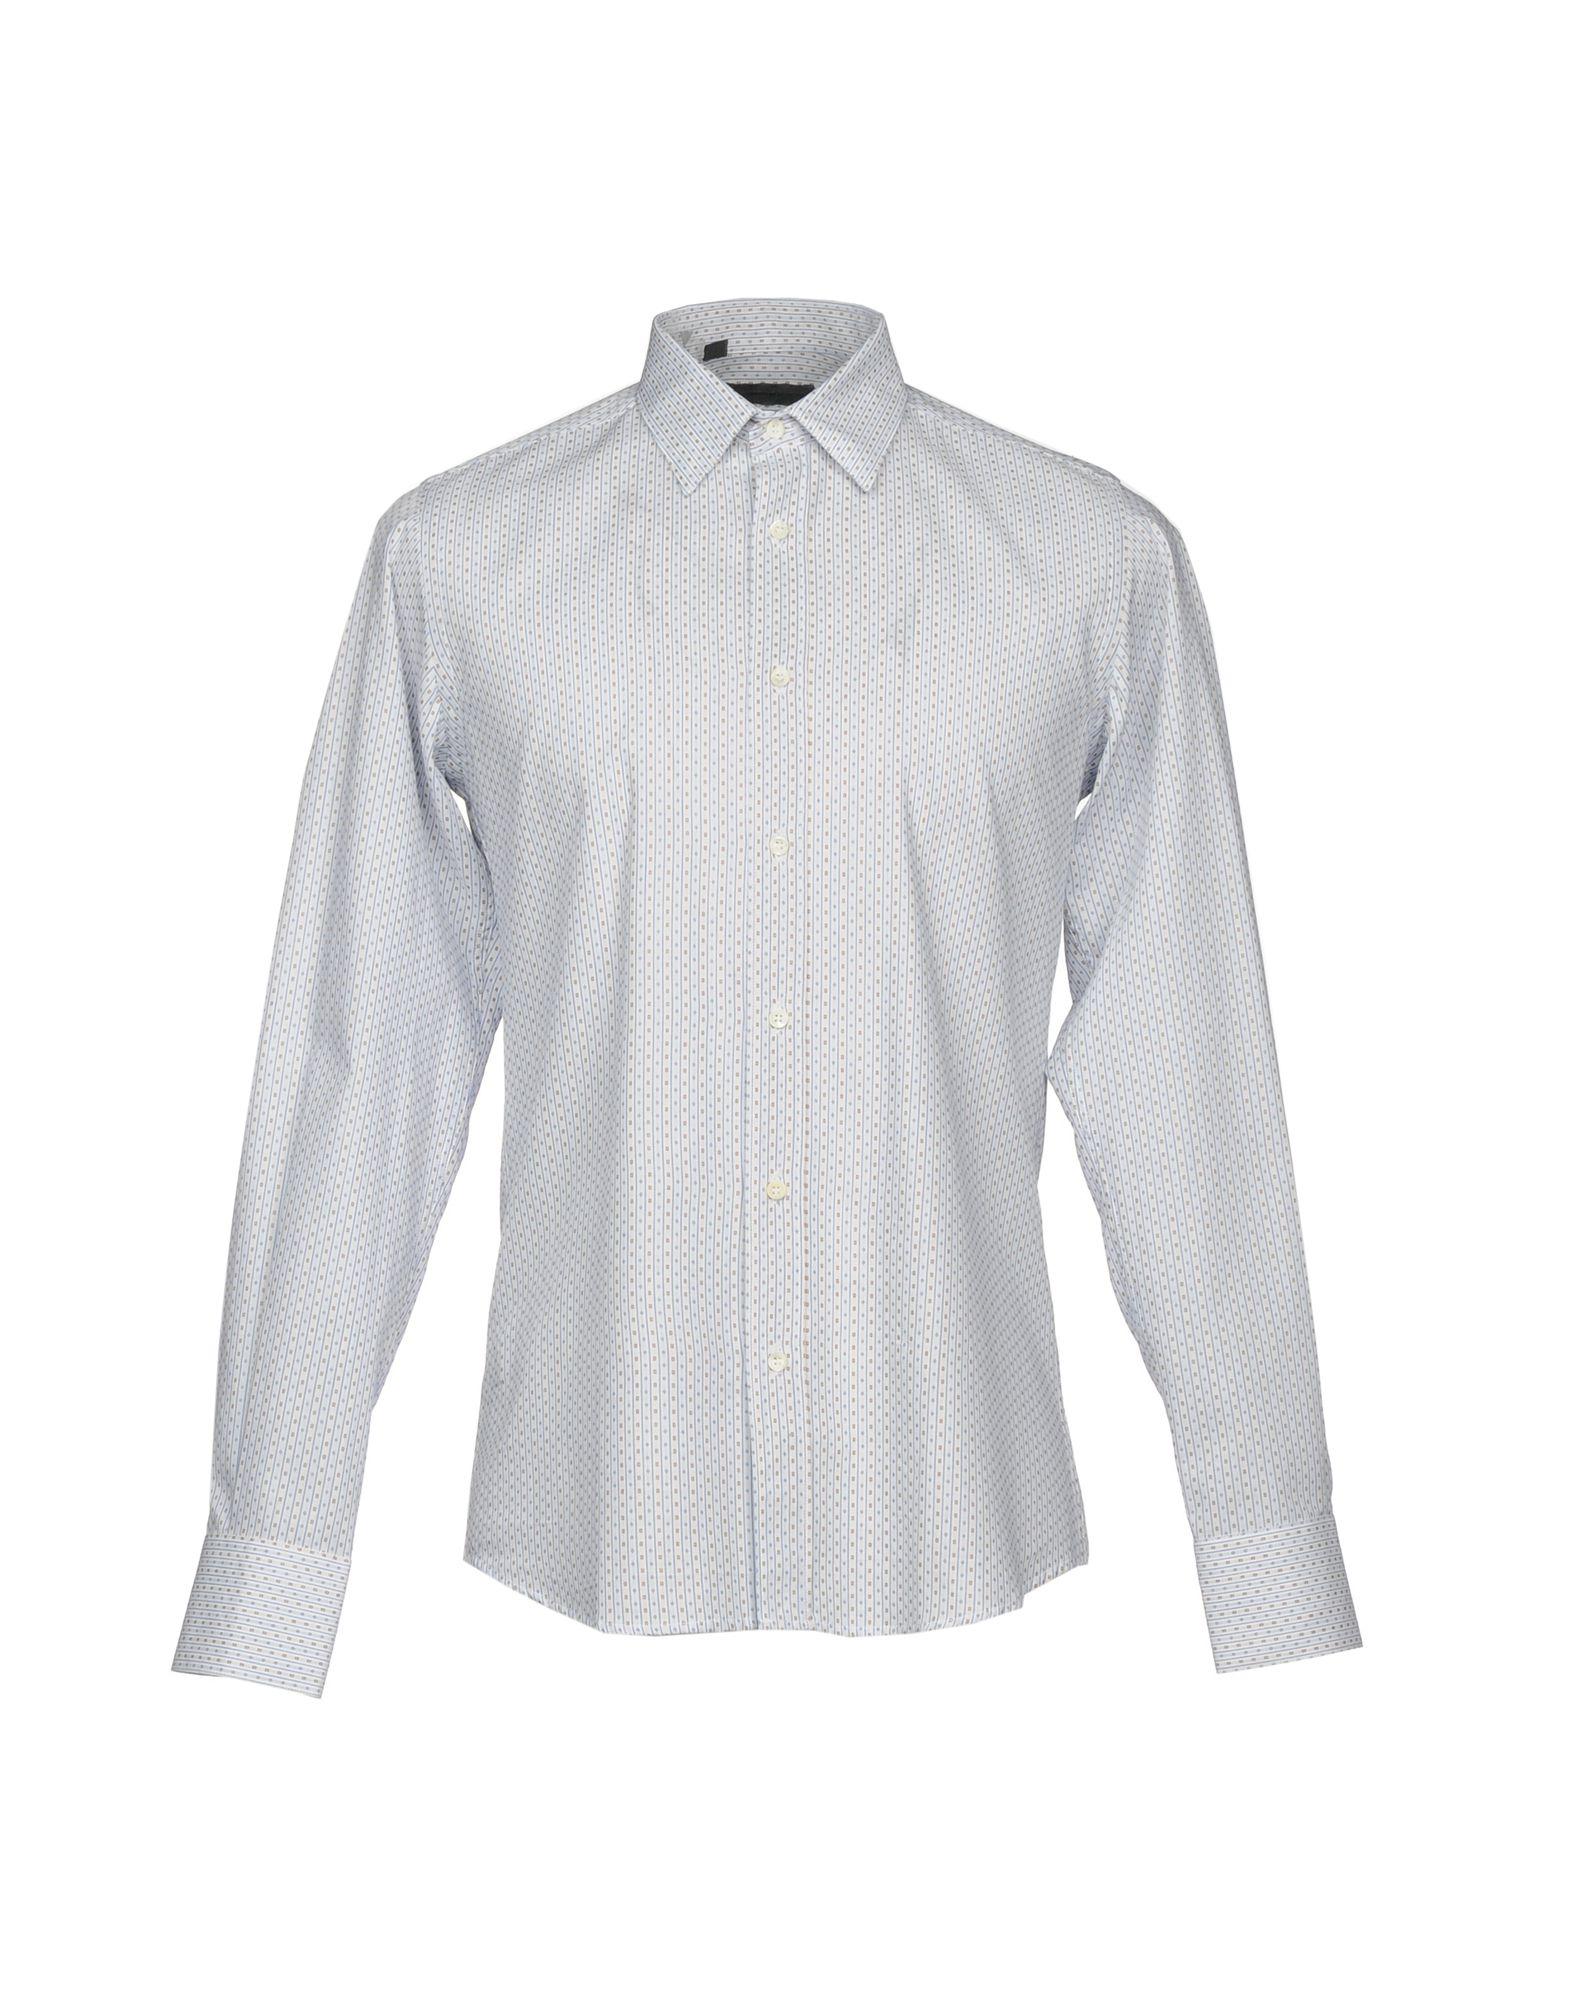 ALESSANDRO DELL´ACQUA Herren Hemd Farbe Blau Größe 4